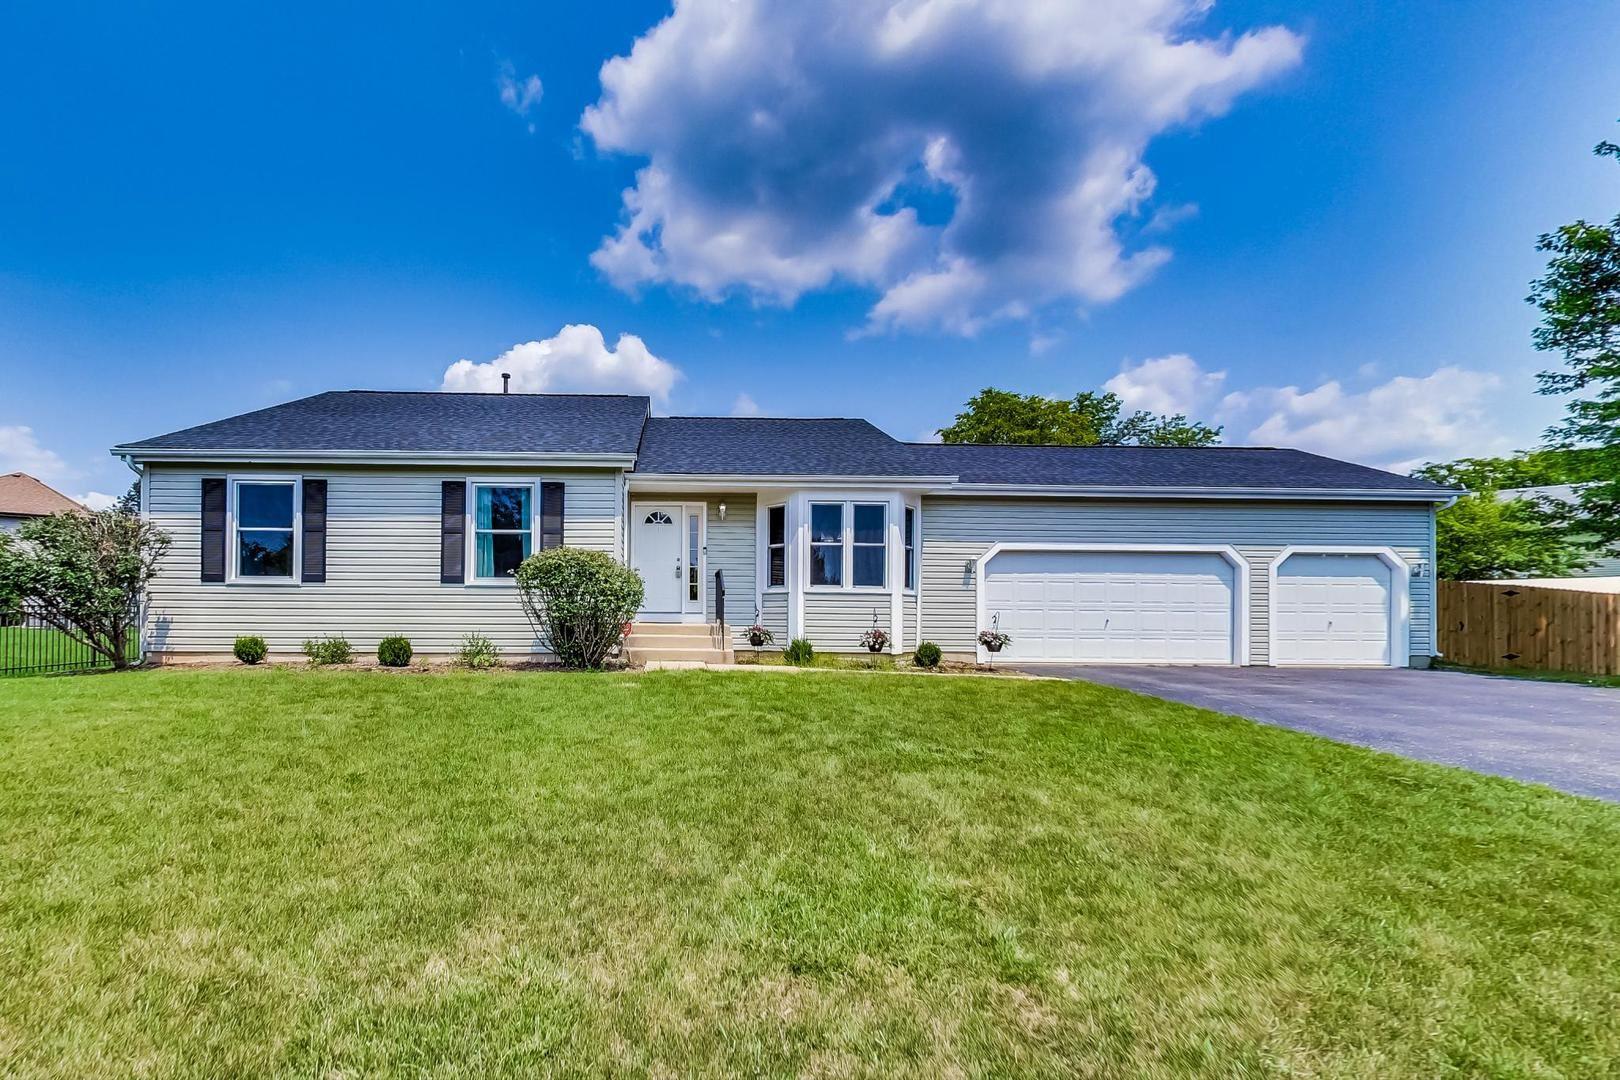 1278 Amberwood Drive, Crystal Lake, IL 60014 - #: 11184274